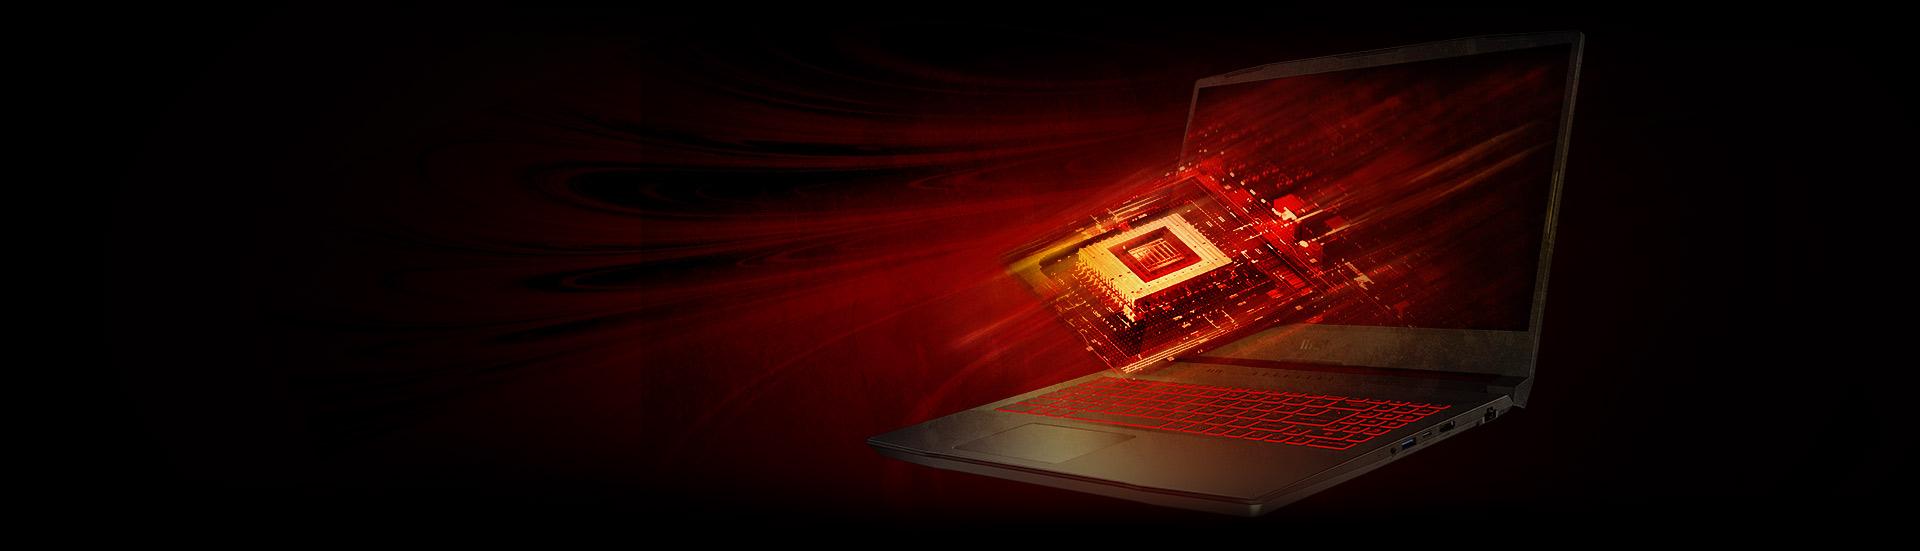 msi katana laptop 3DMark Time Spy benchmark with directX 12 engine